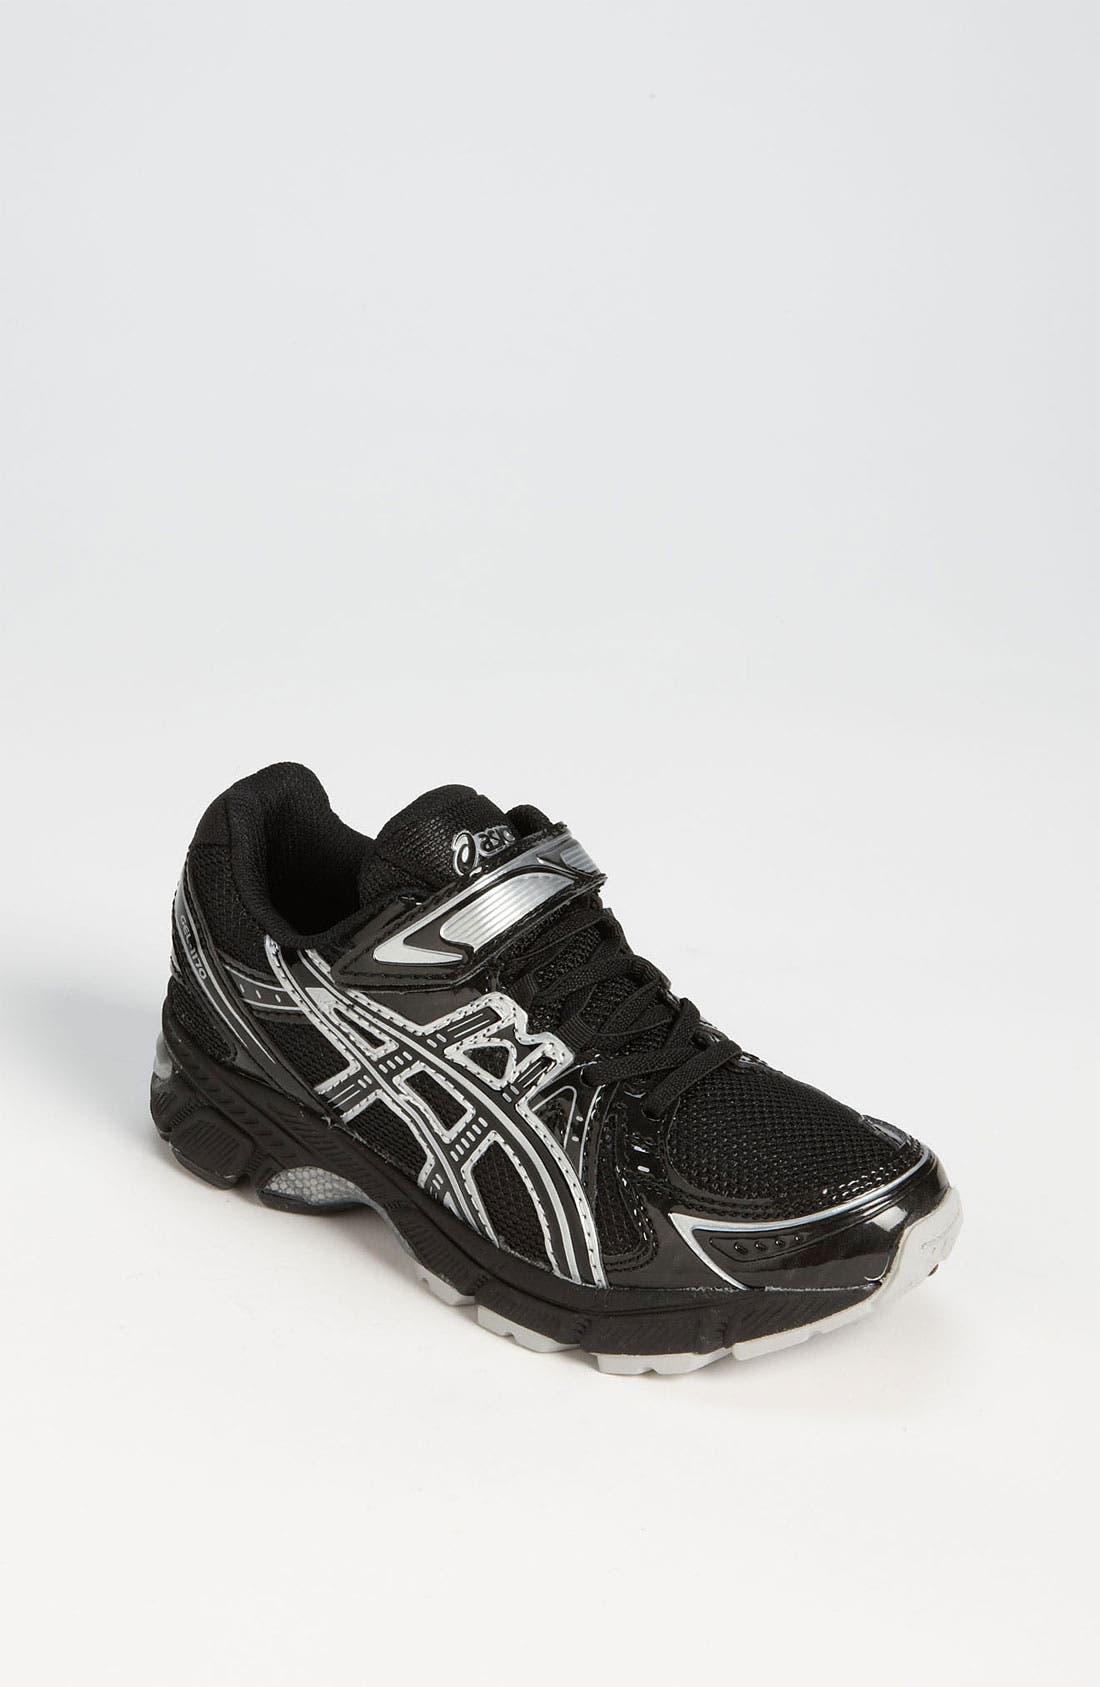 Alternate Image 1 Selected - ASICS® 'GEL®-1170™' Running Shoe (Toddler, Little Kid & Big Kid)